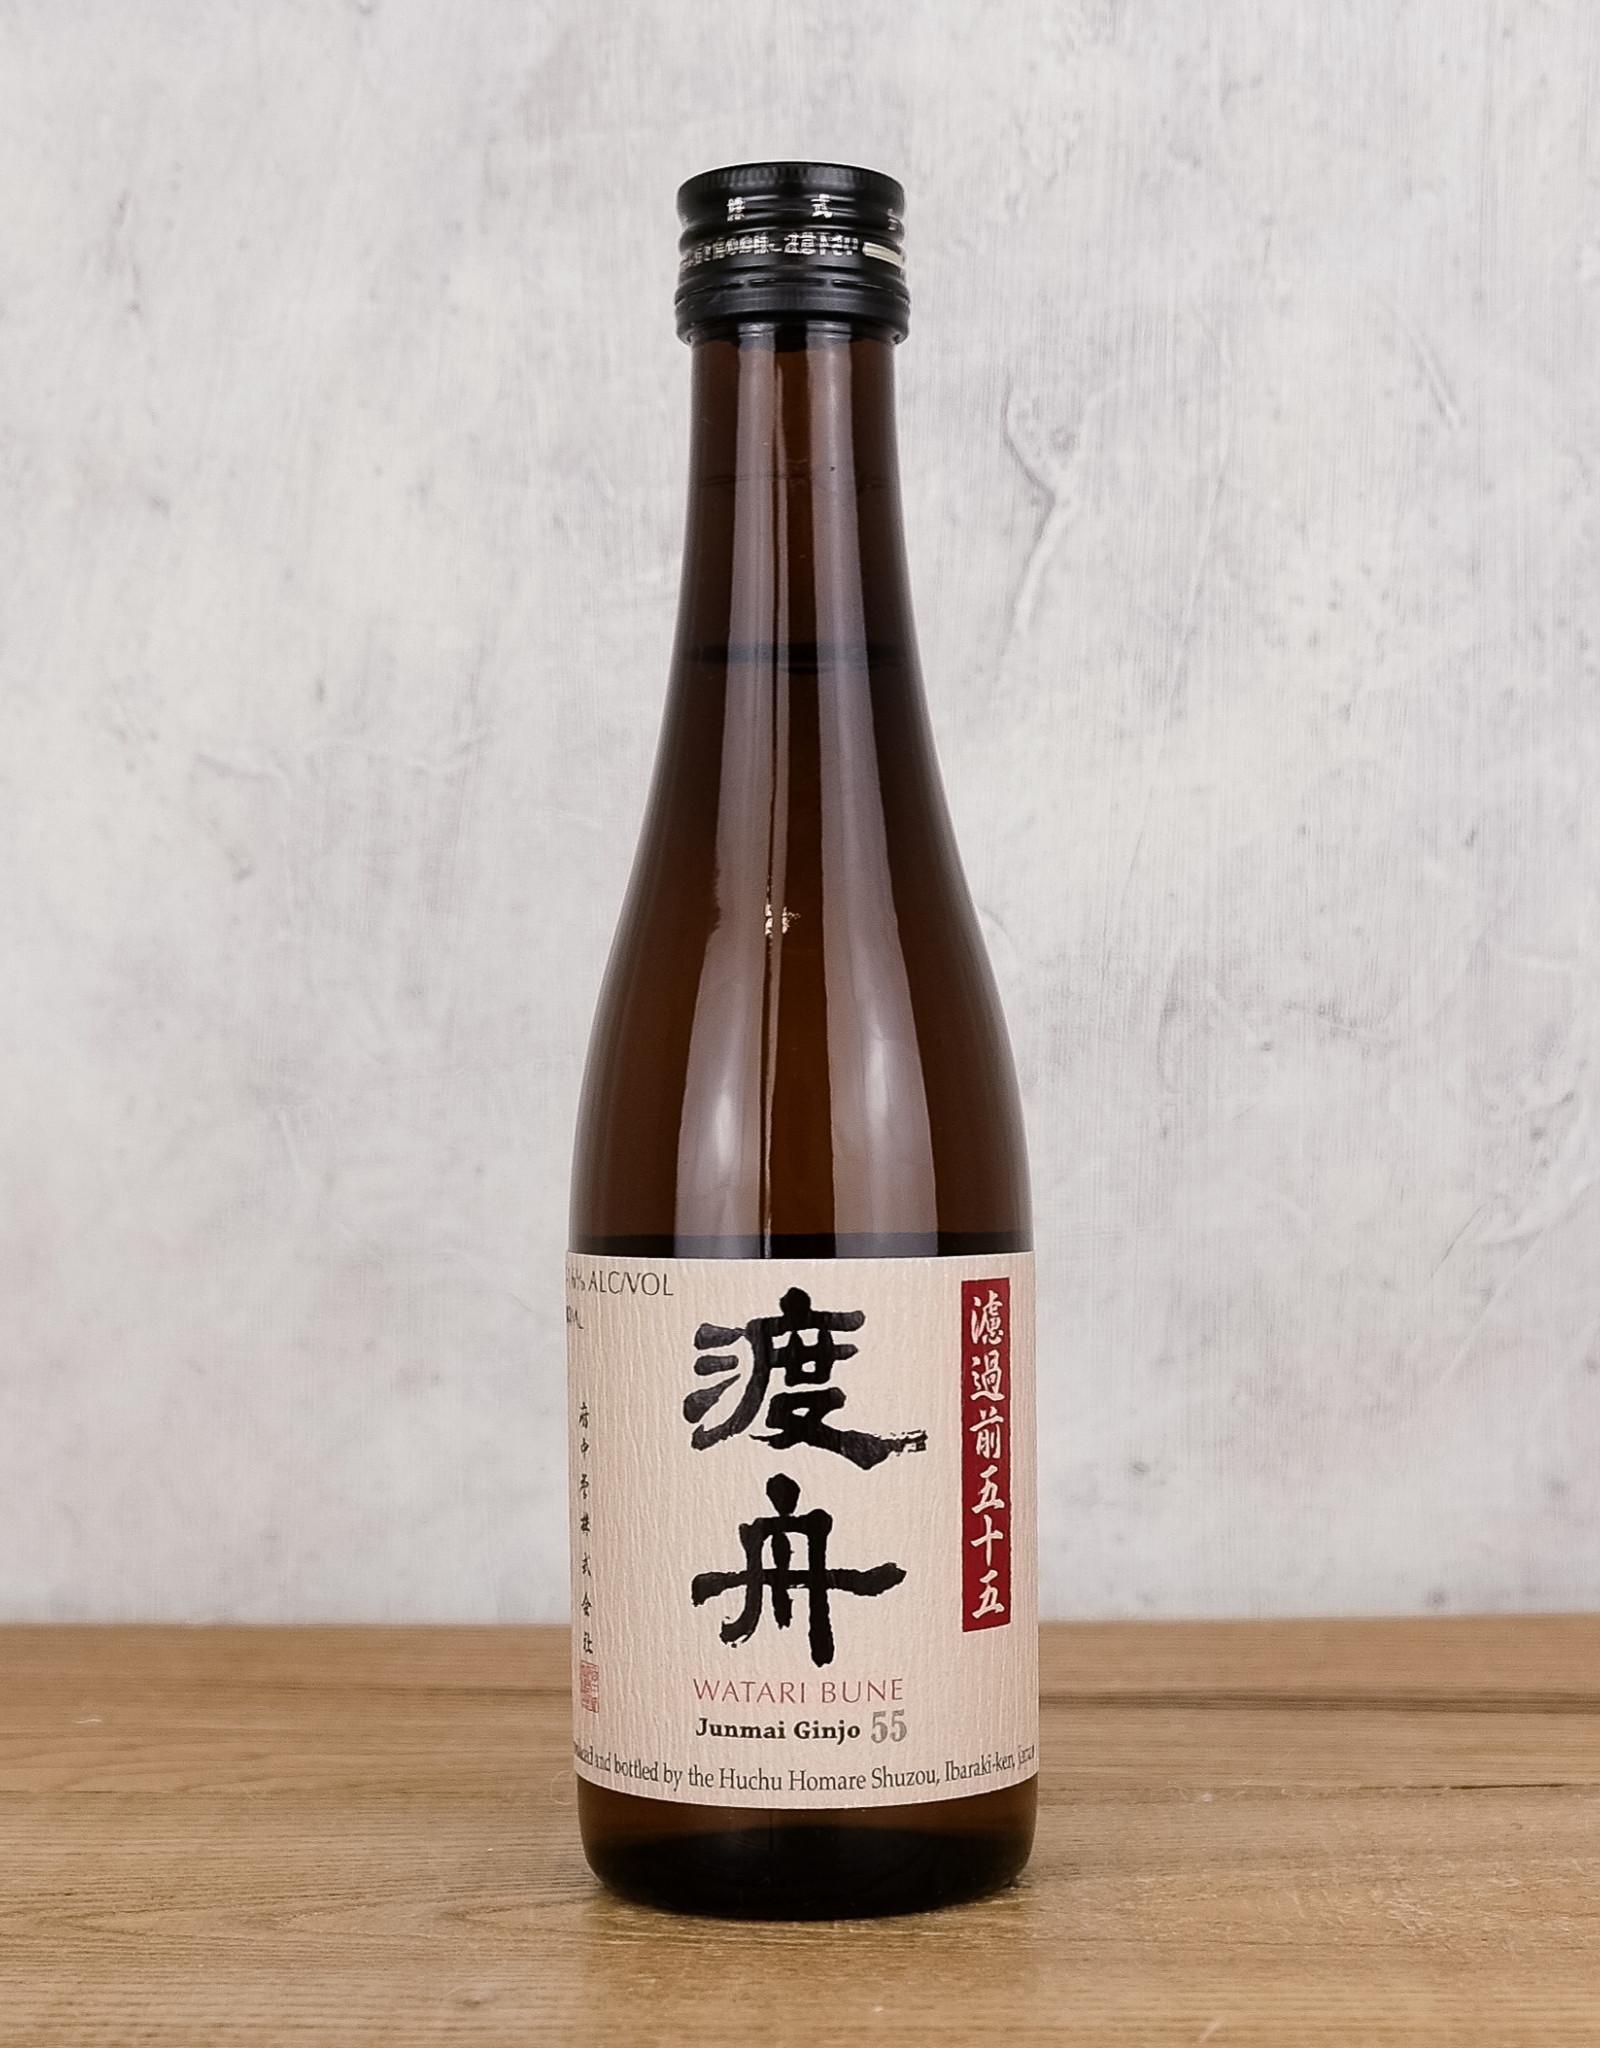 Watari Bune Junmai Gingo Sake 300ml